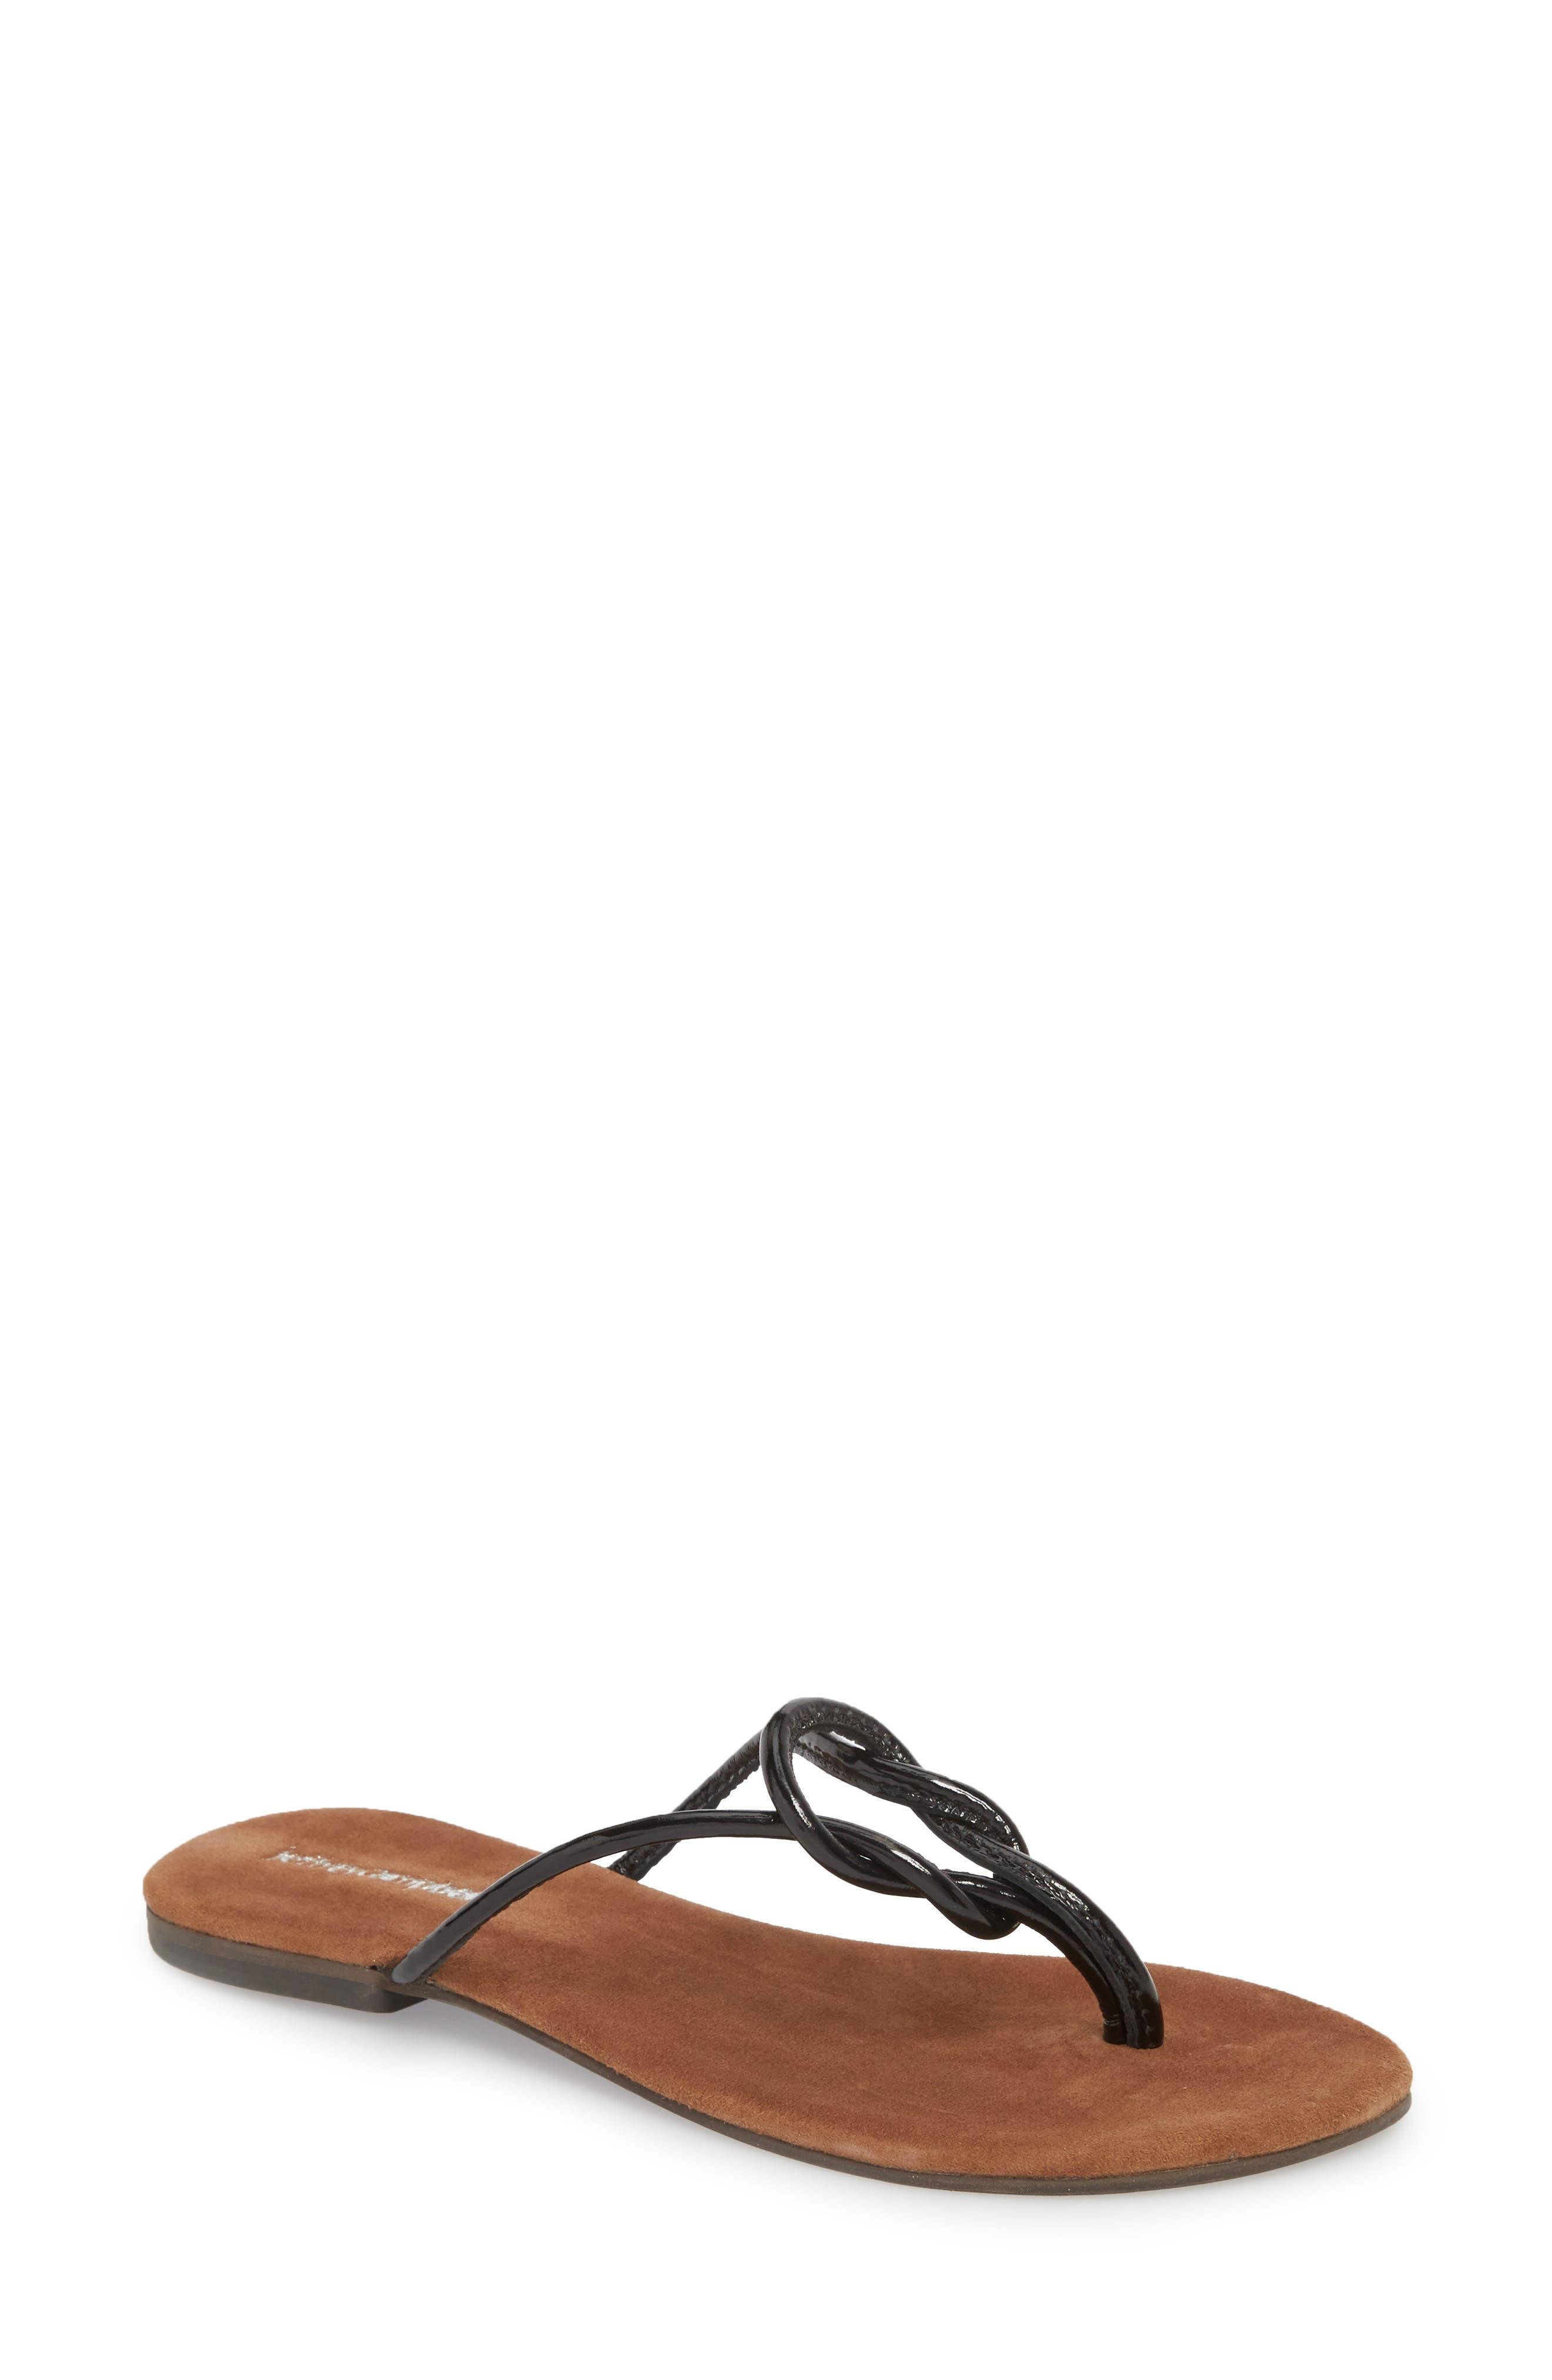 Malia Flip Flop,                         Main,                         color, 009